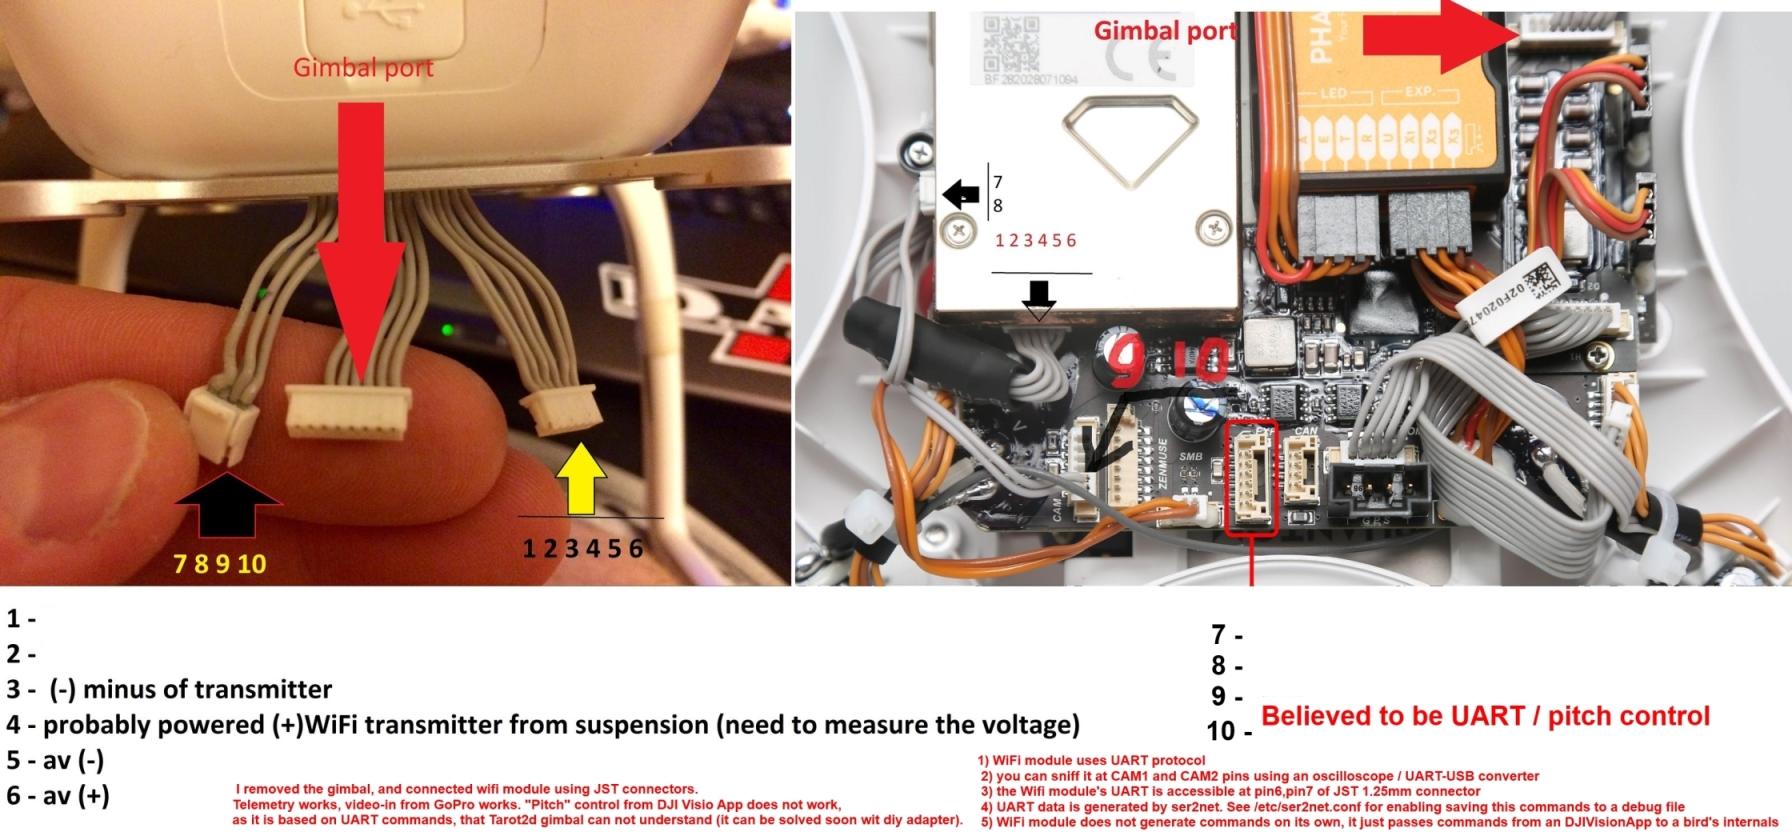 hight resolution of dji phantom plus wiring diagram simple wiring schemavision stock fpv with 3rd party camera working dji